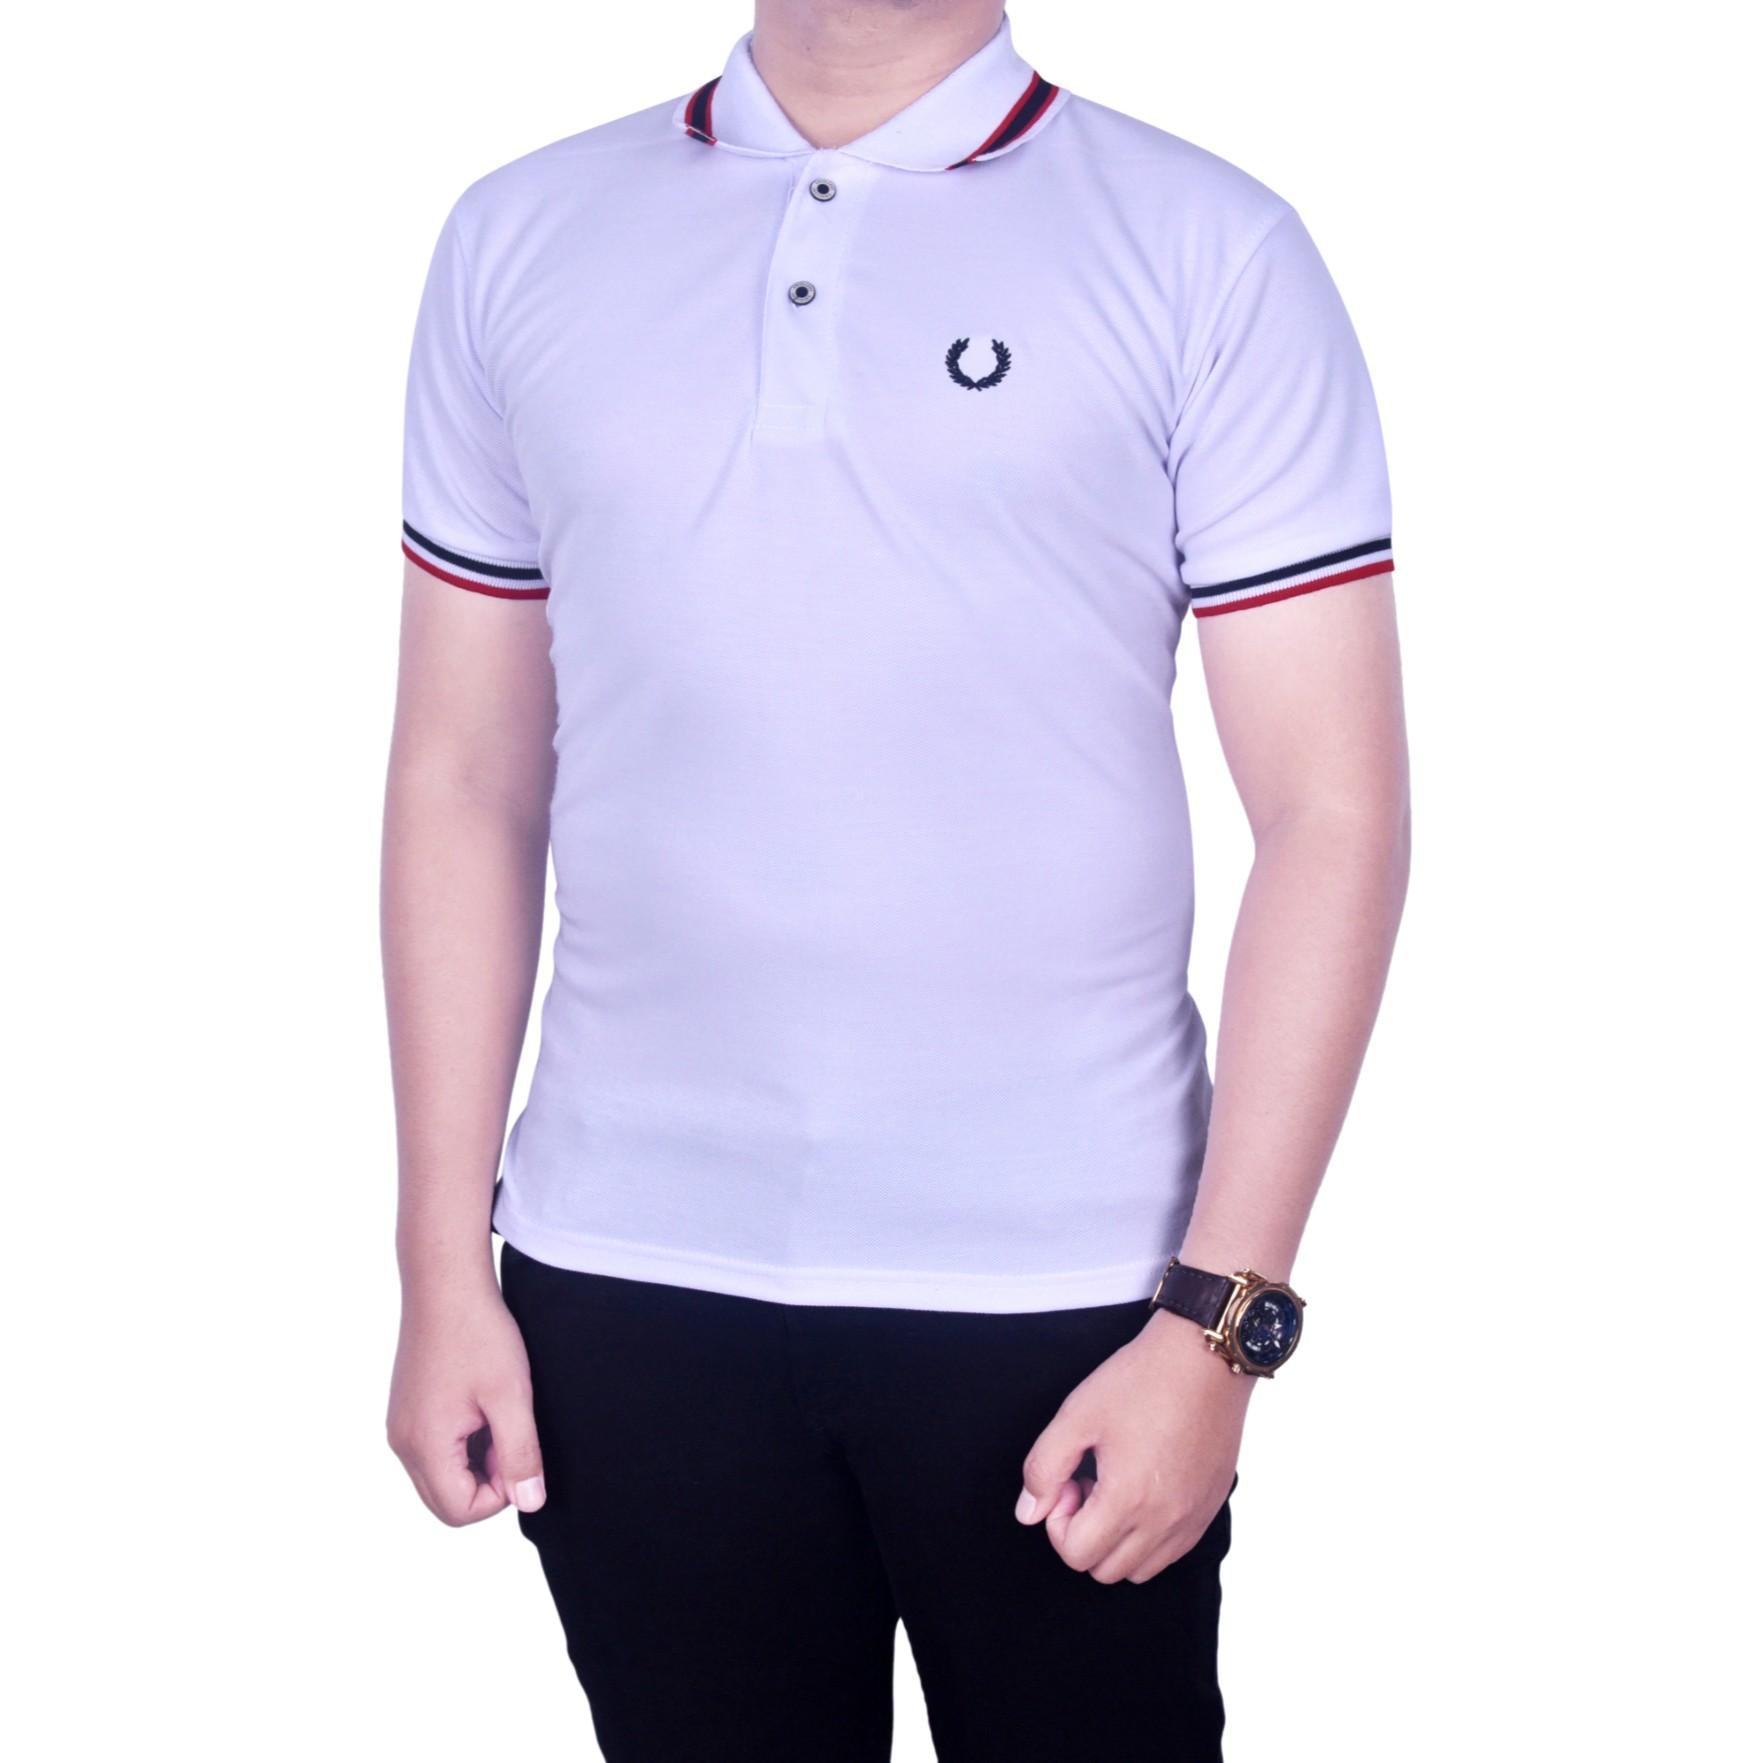 Polo Shirt Pria Terbaru Murah Kaos Kerah Polos  Grosir Bordir Dgm Fashion1 Baju Putih Sanghai